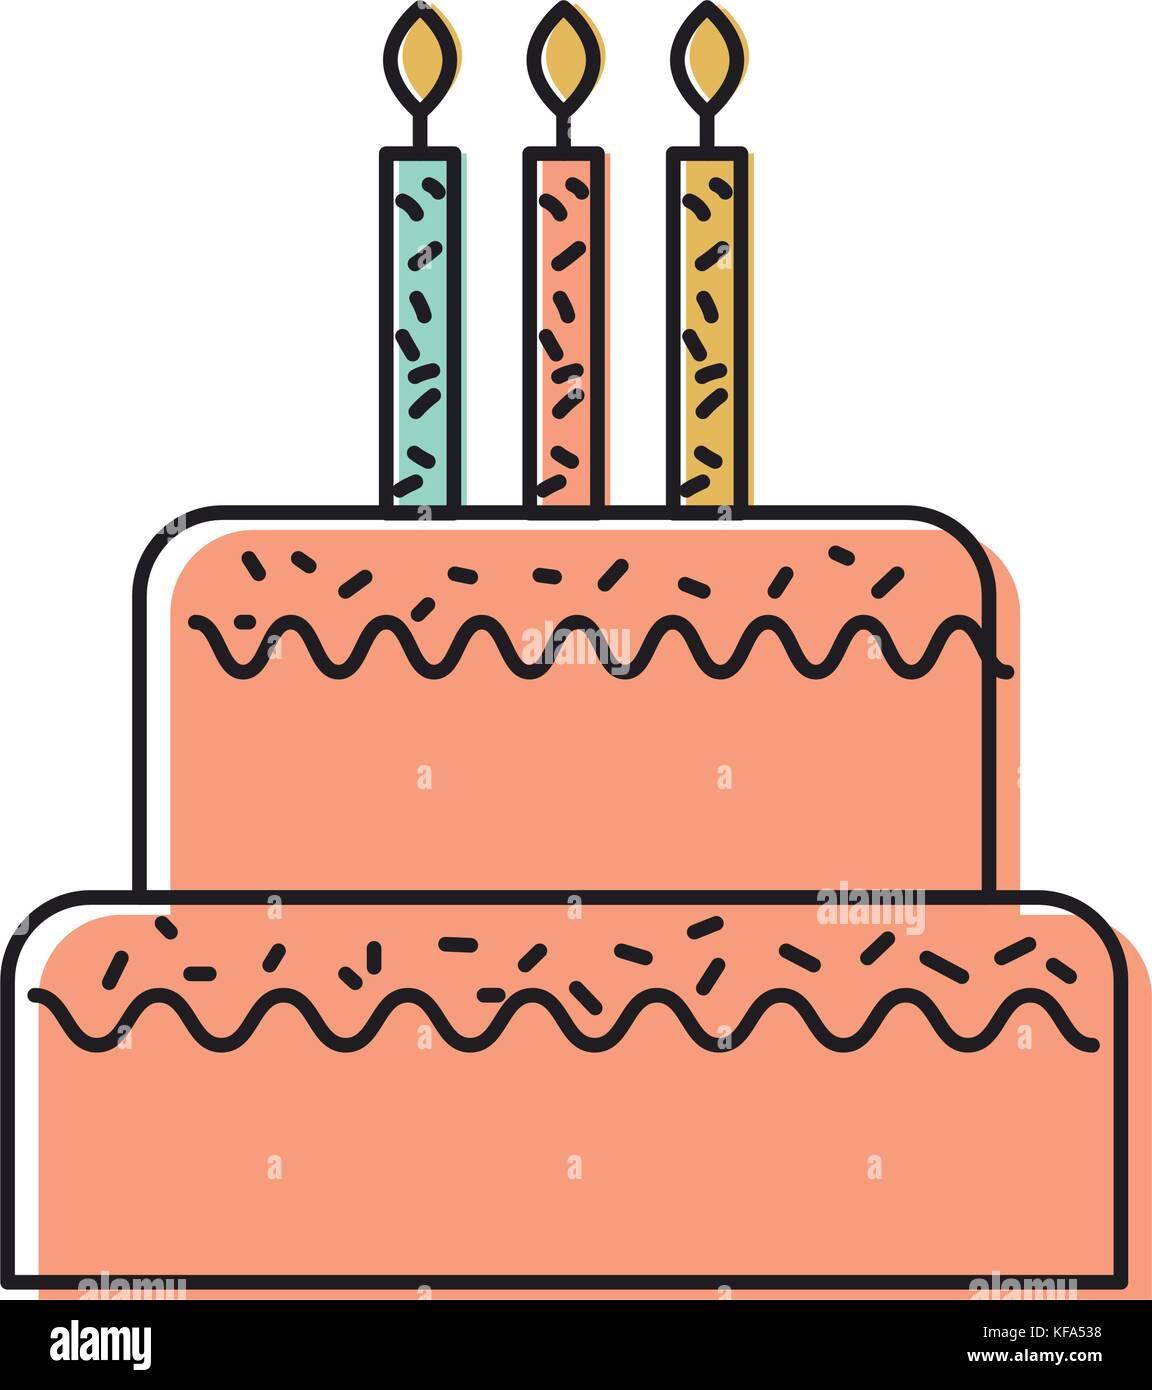 happy birthday cake burning candles stock photos amp happy